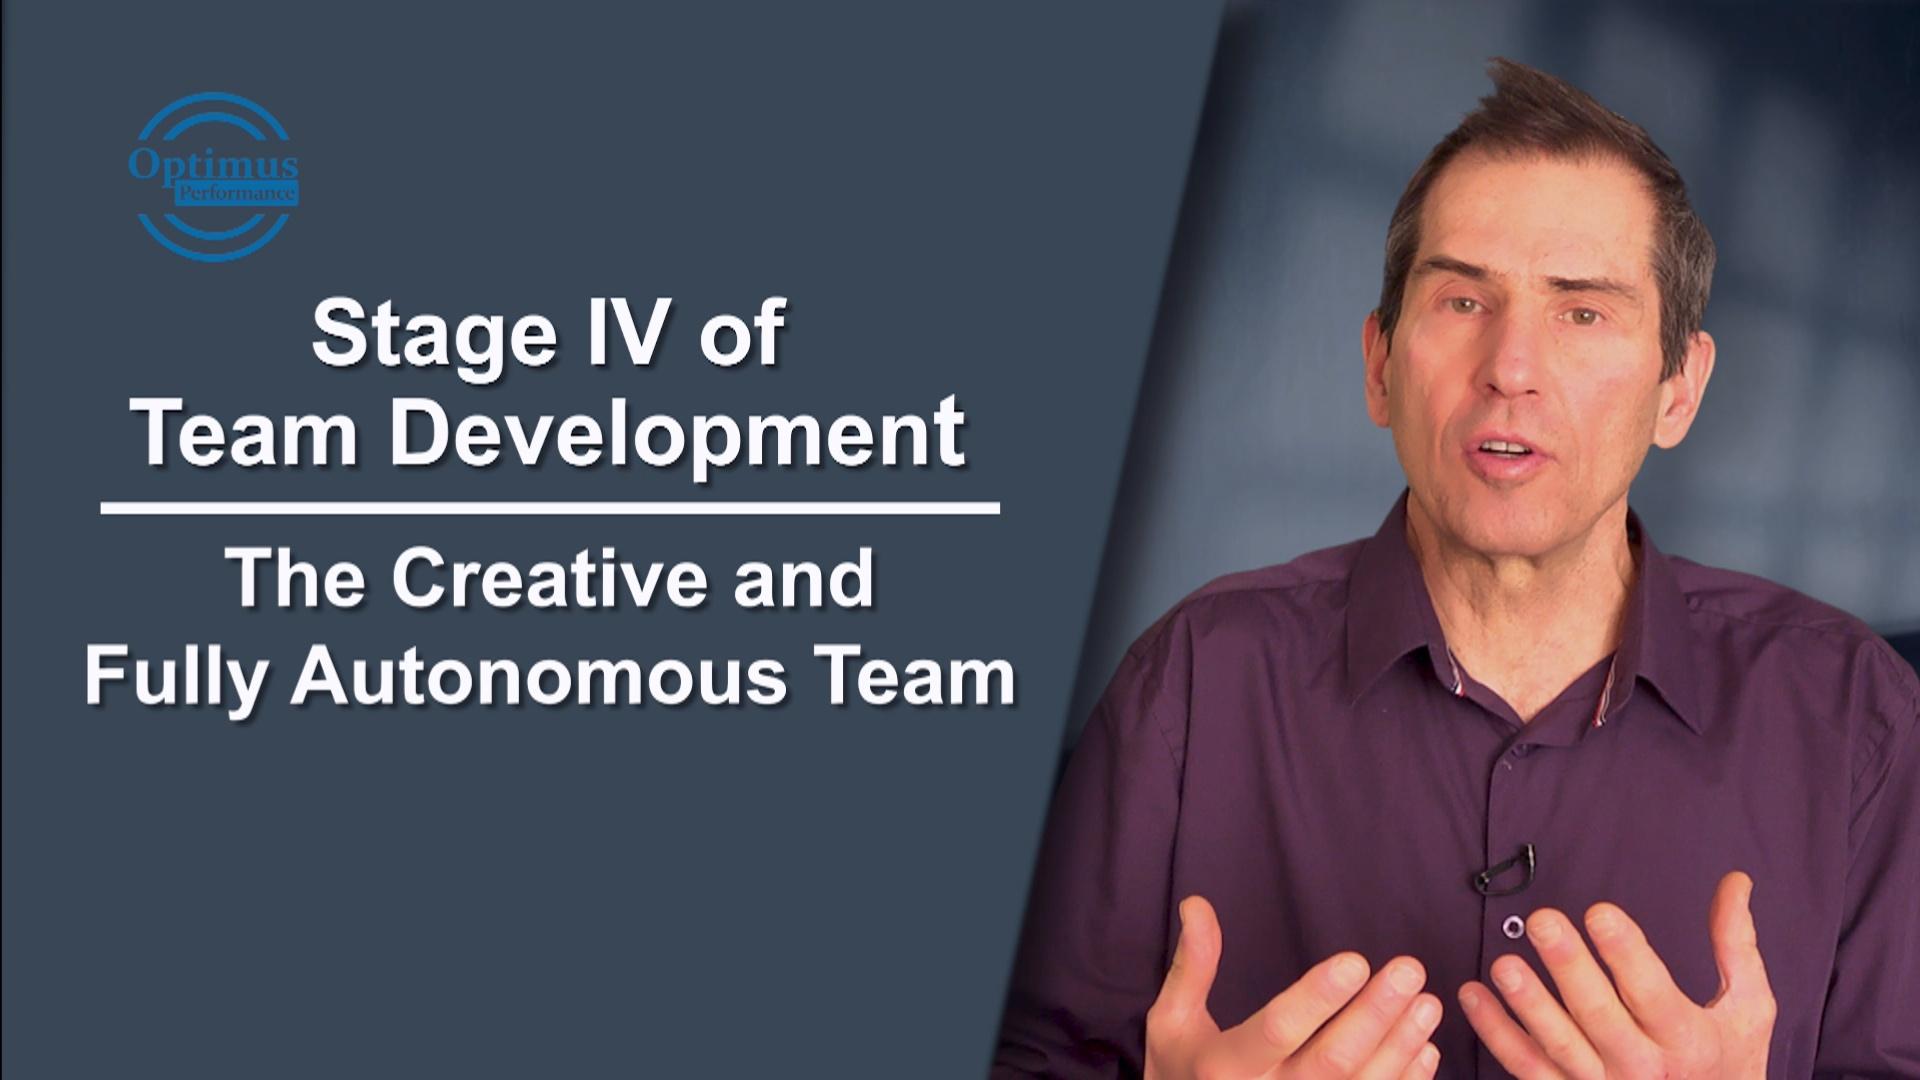 Stage Iv Of Team Development The Autonomous And Creative